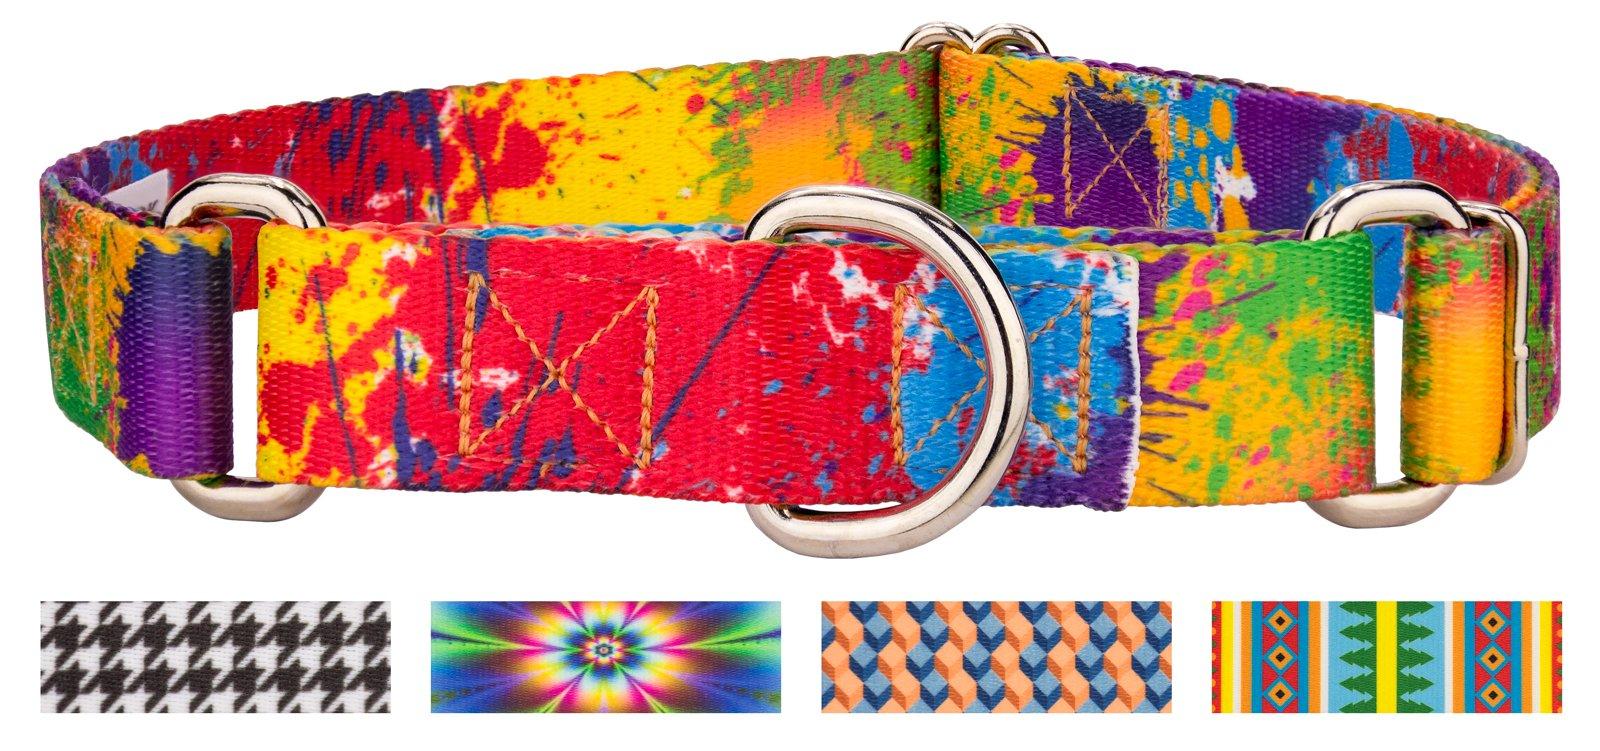 Country Brook Design Paint Splatter Martingale Dog Collar - Medium